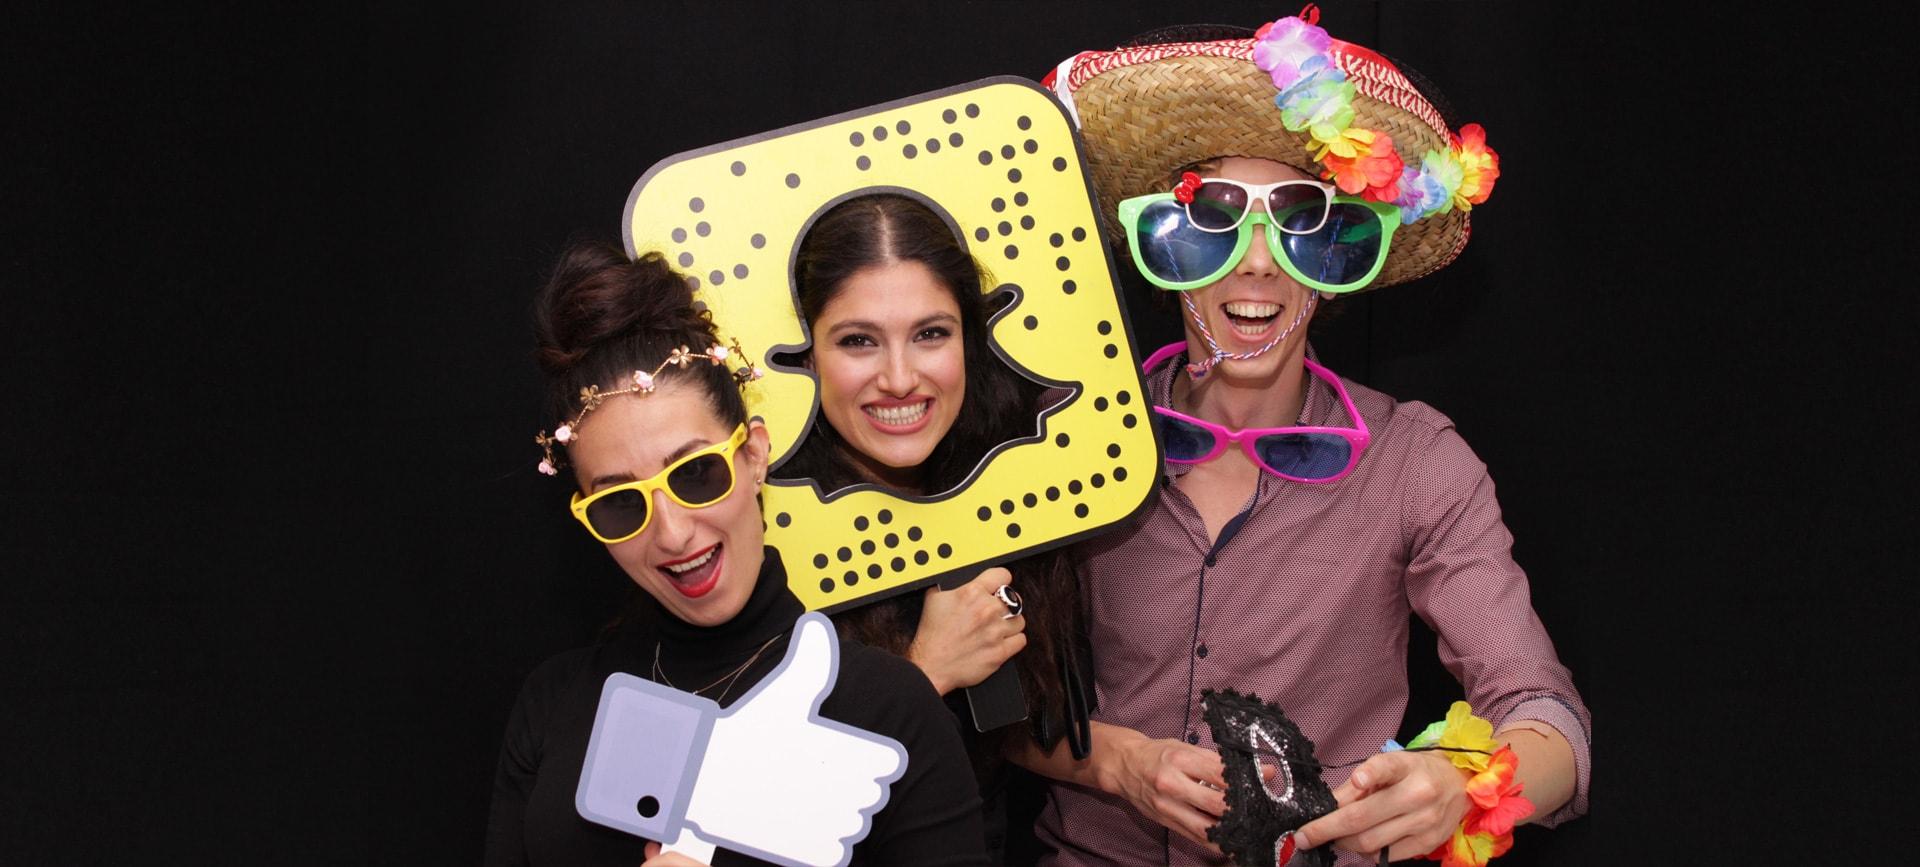 Open Air Photo Booth Hire London | Wedding Selfie Pod, Camera & Backdrop